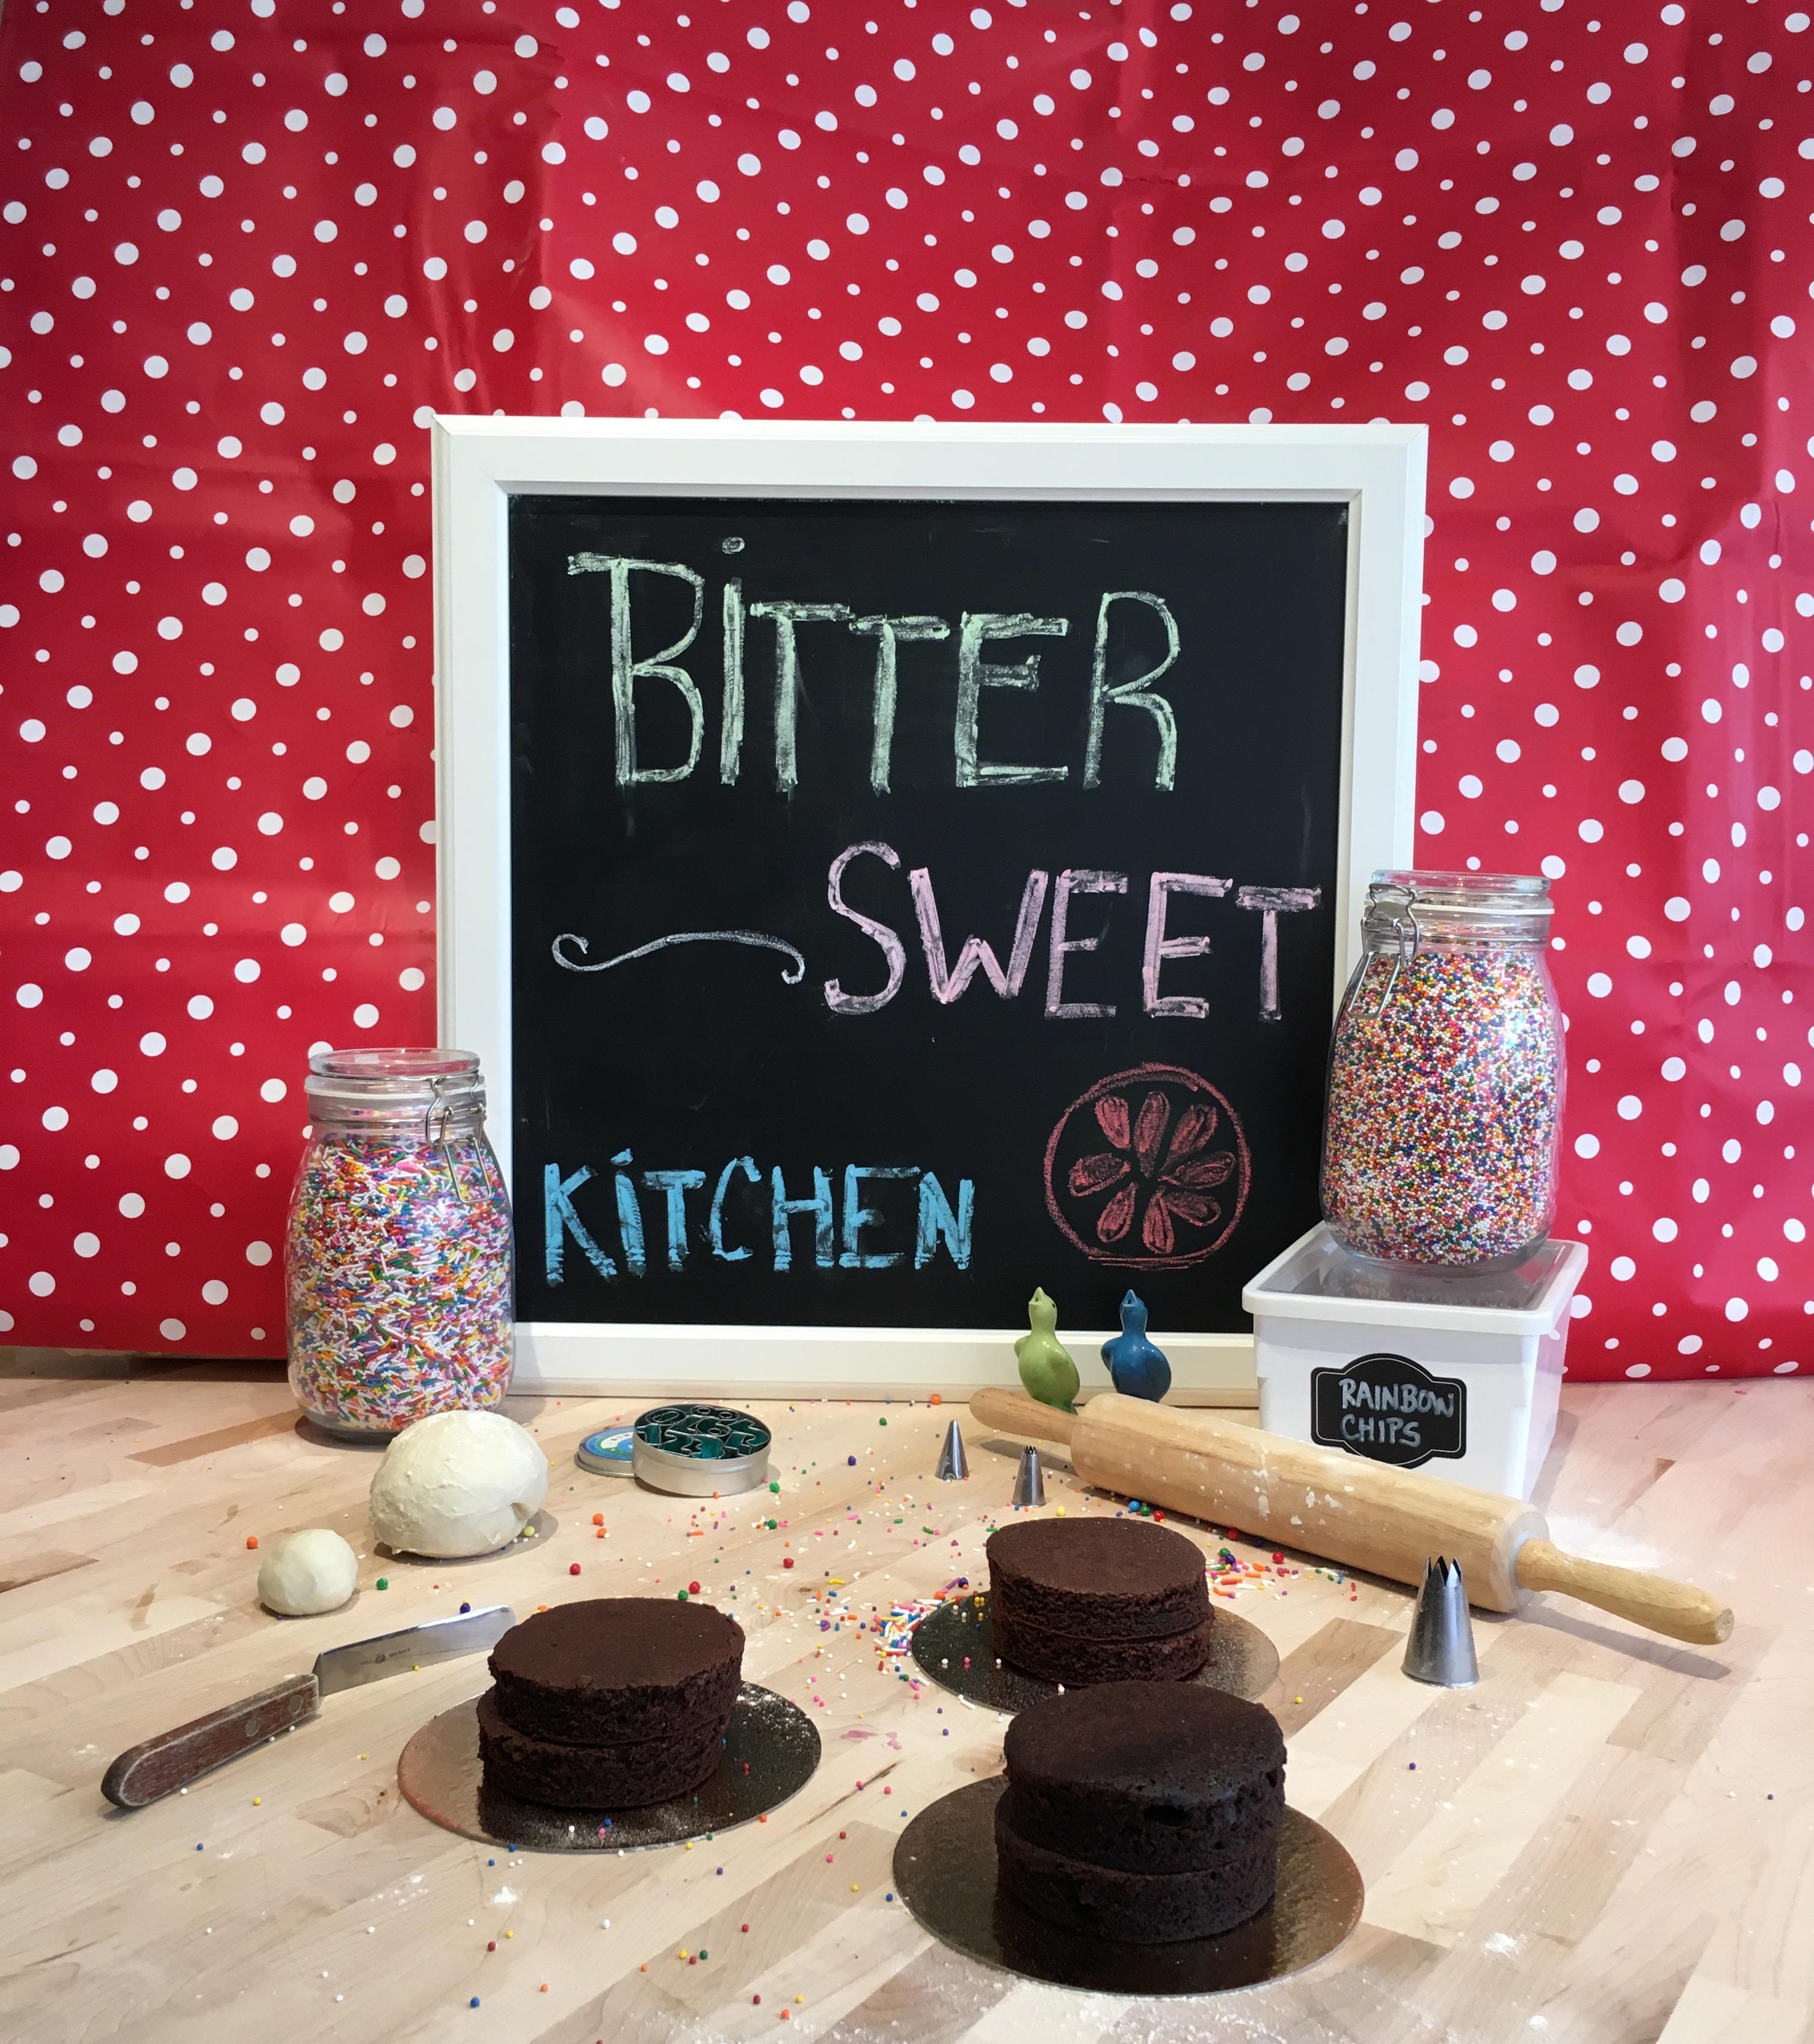 BitterSweet Kitchen